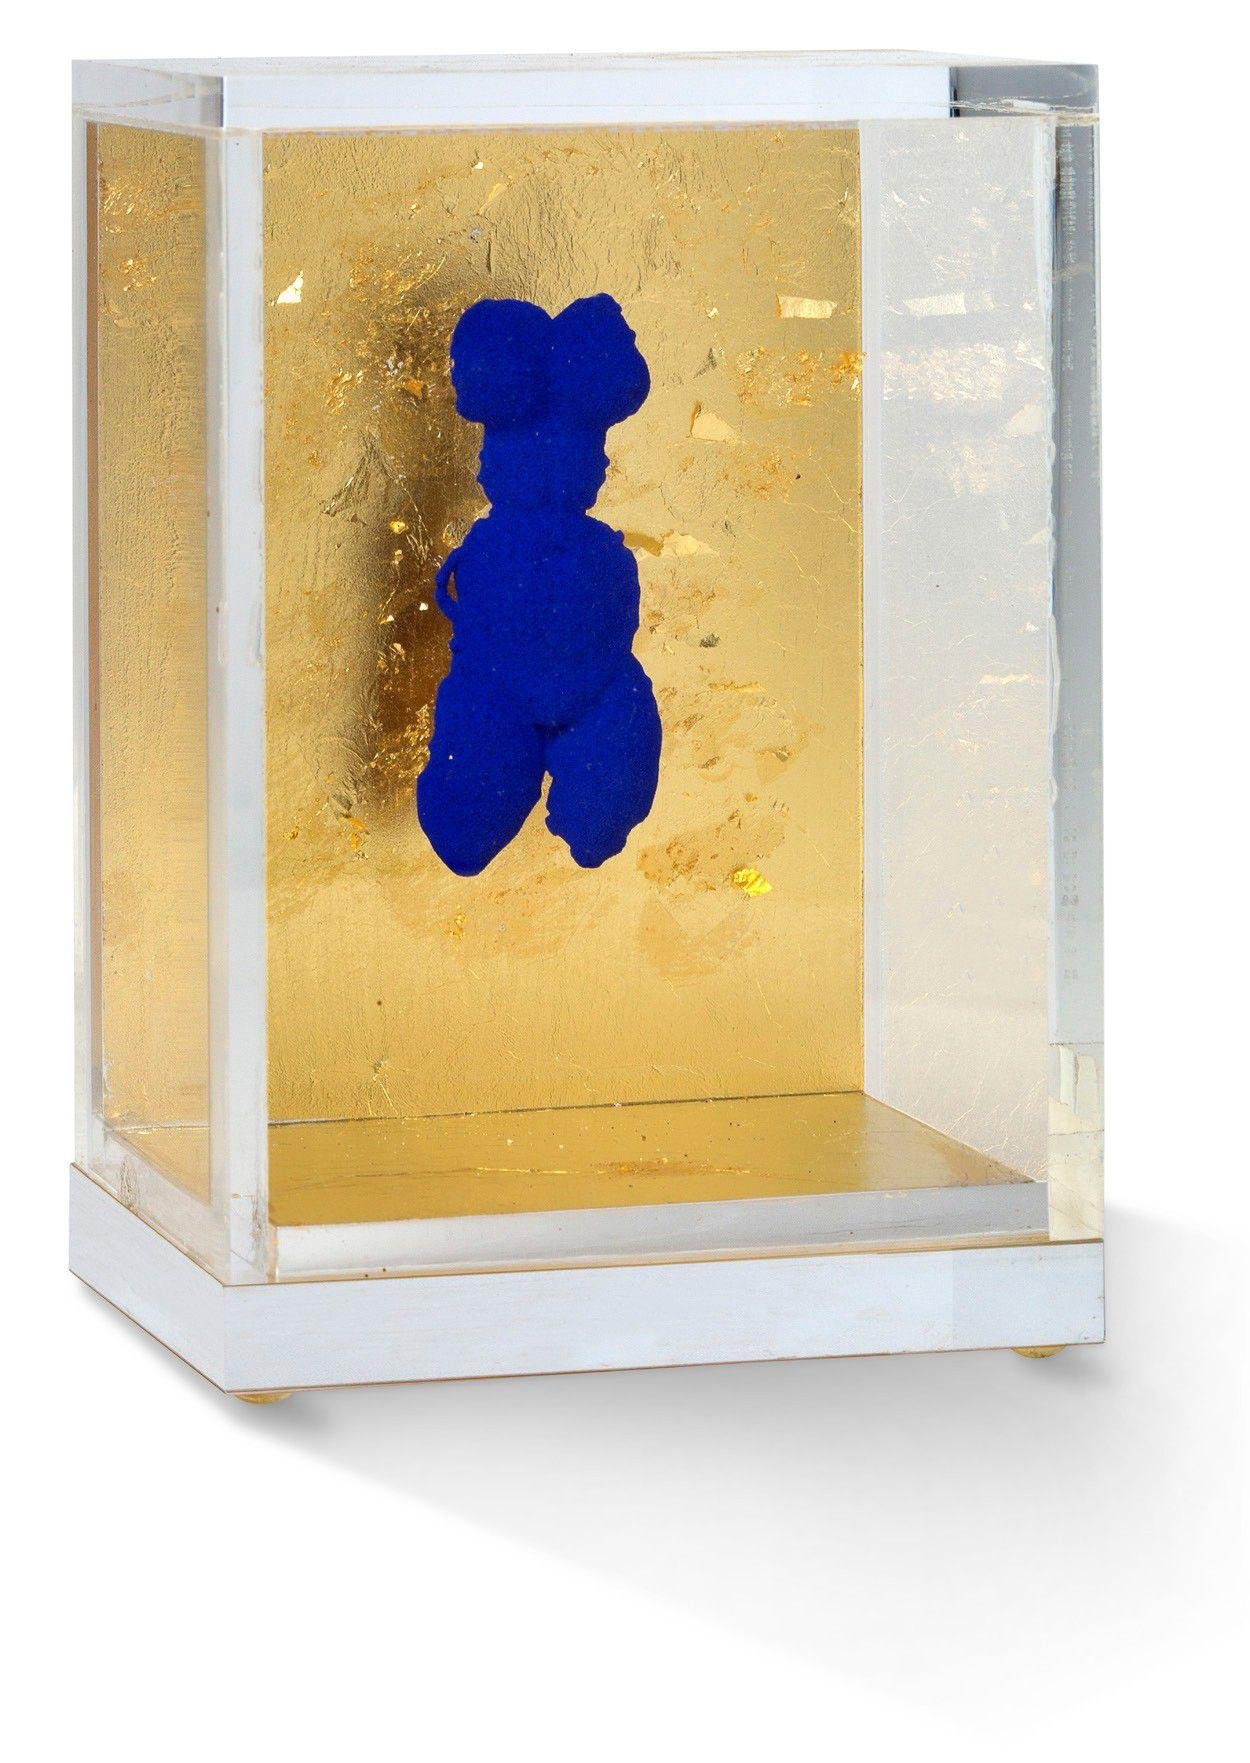 Yves Klein Small IKB Venus Brooch Sculpture Jewel in International Klein Blue